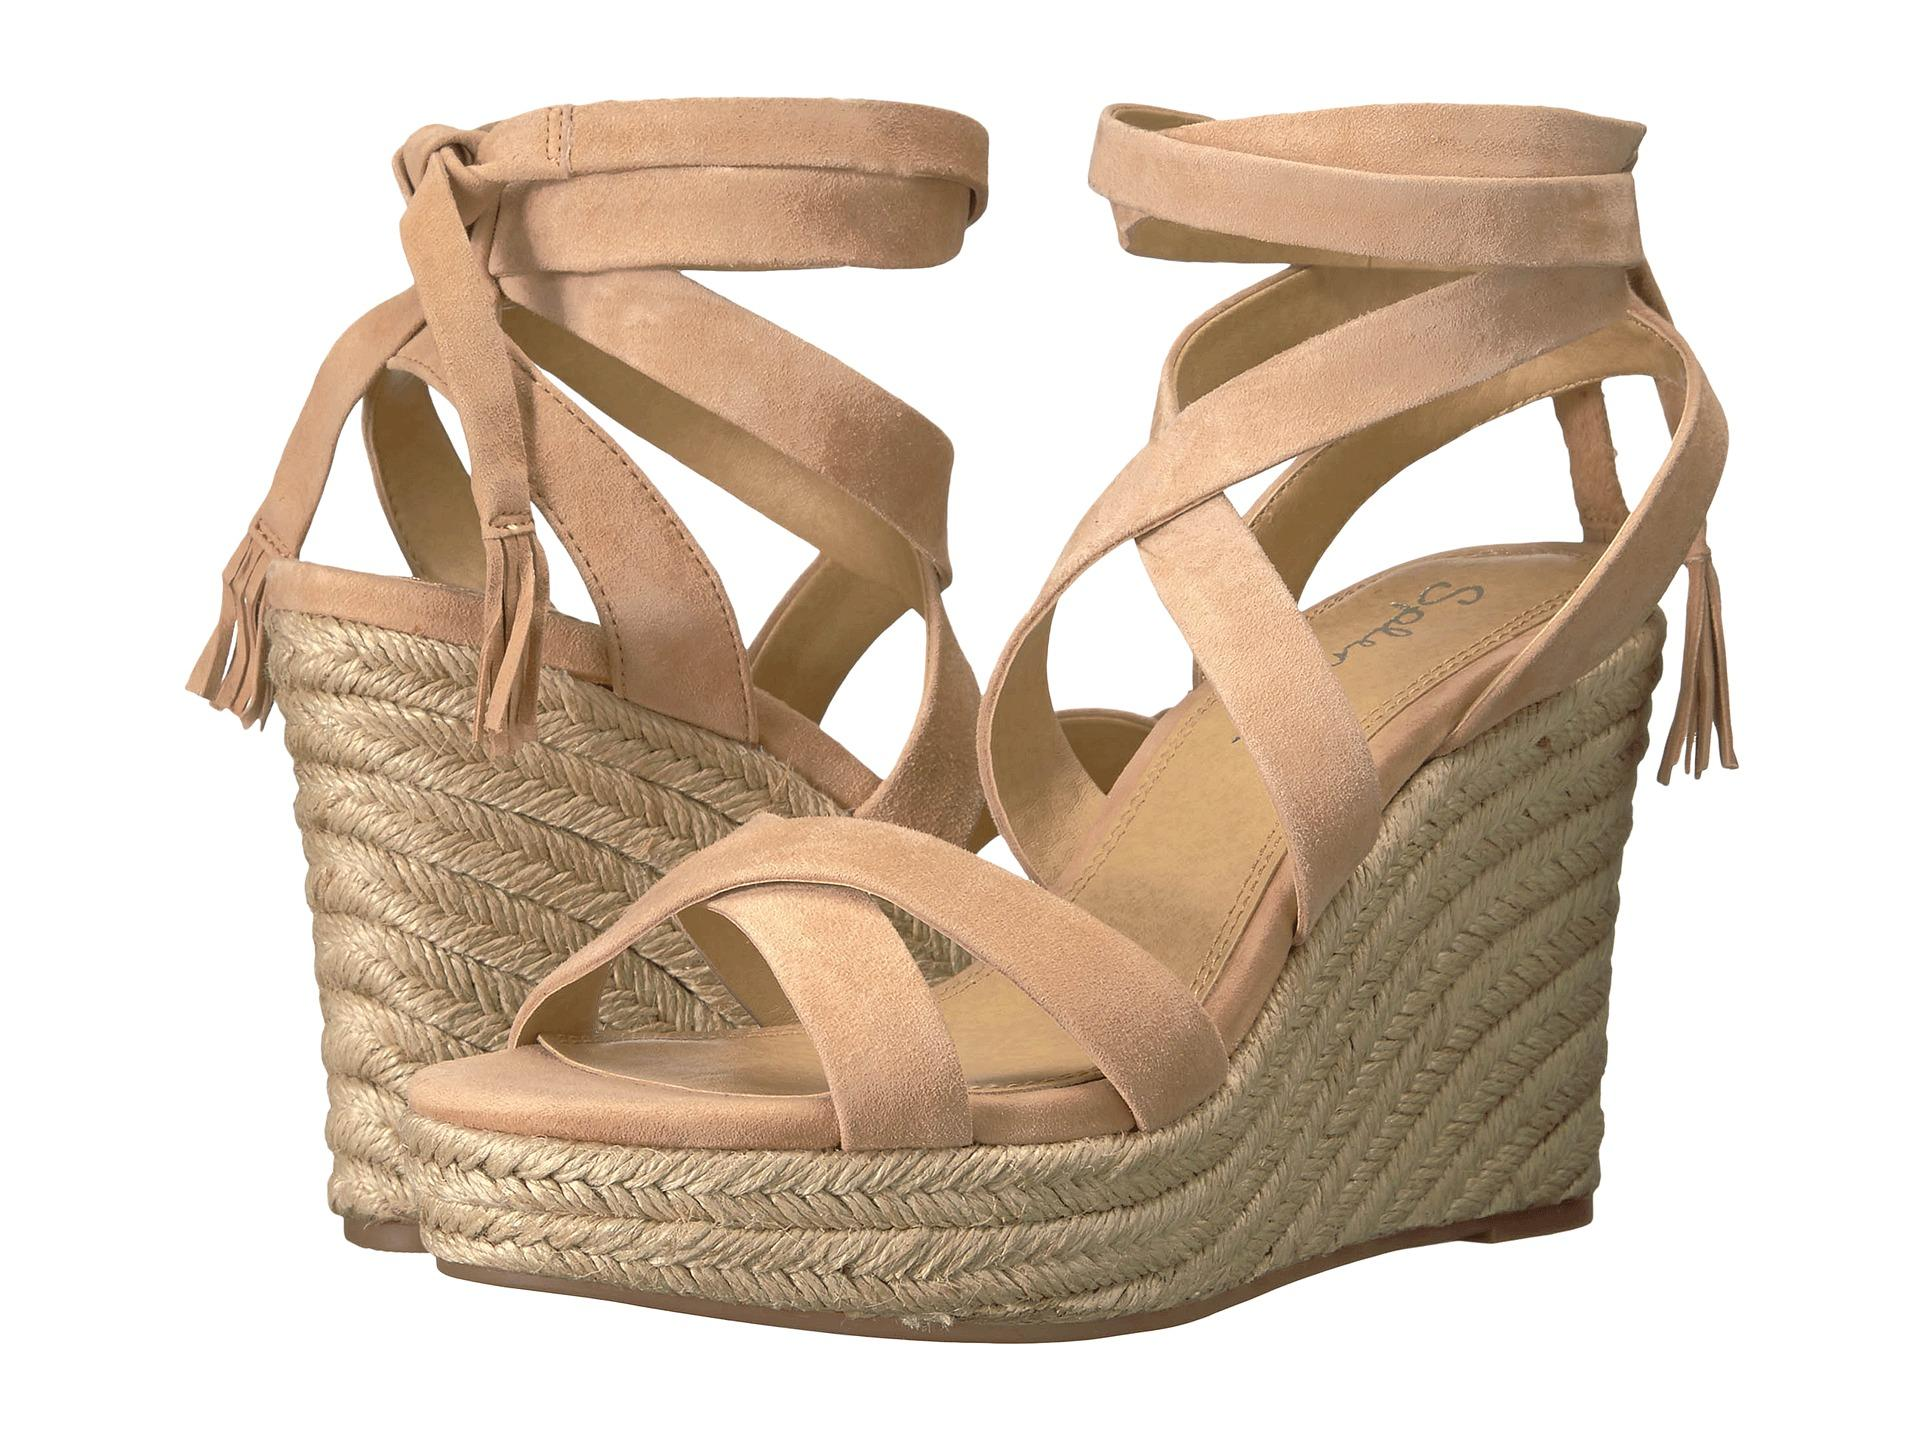 2746be6aca2 Splendid Natural Janice Espadrille Wedge Sandal